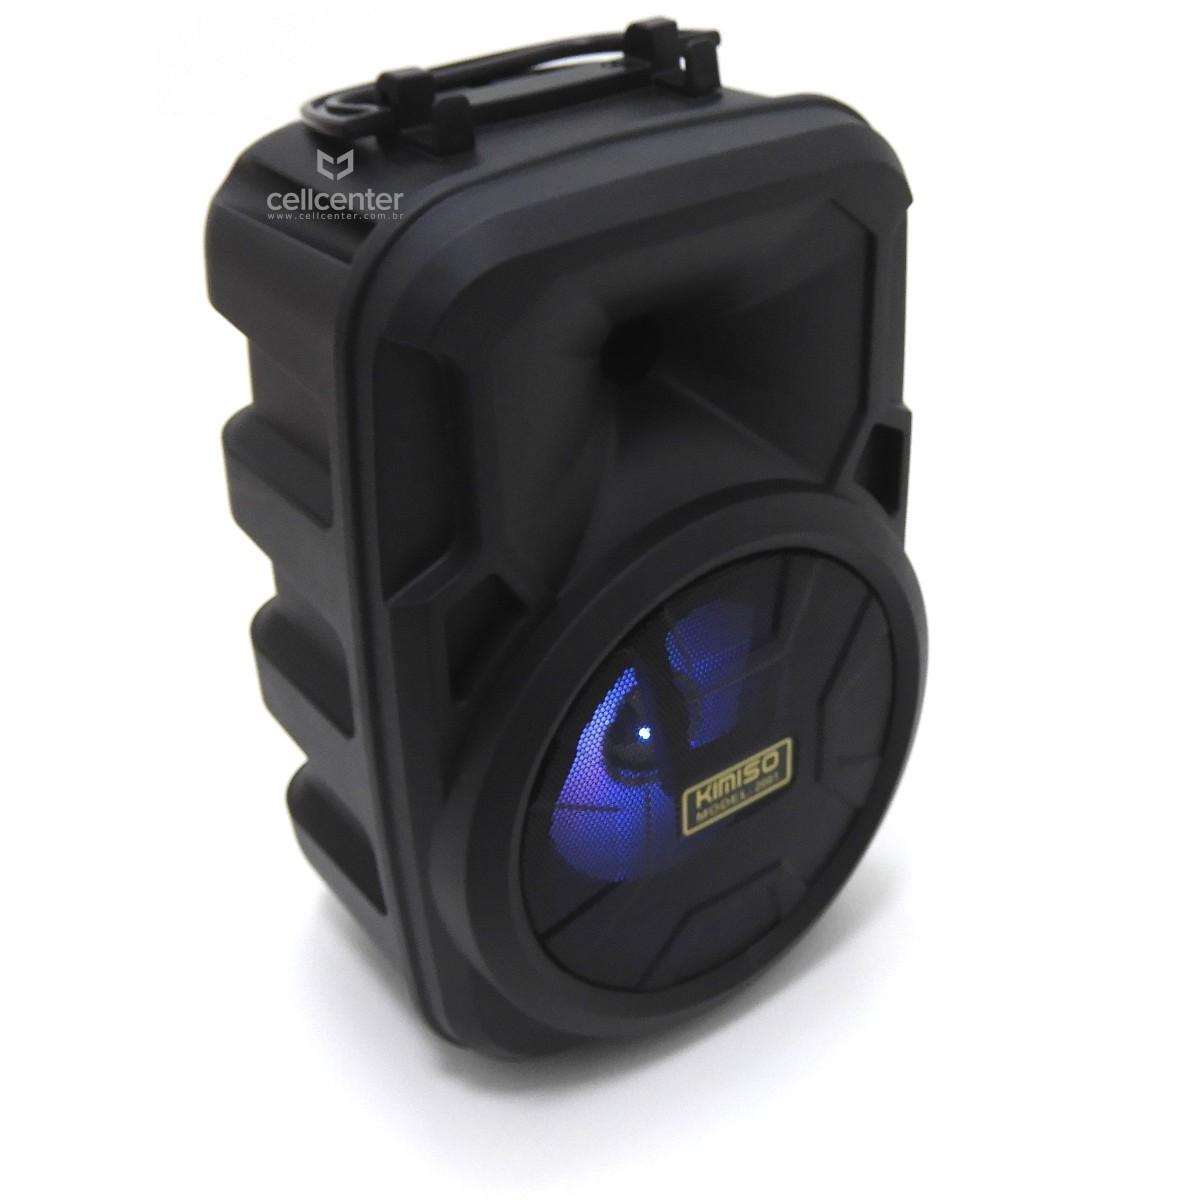 Caixa De Som Bluetooth Mini Entrada P10/P2/USB/TF Kimiso - 2001